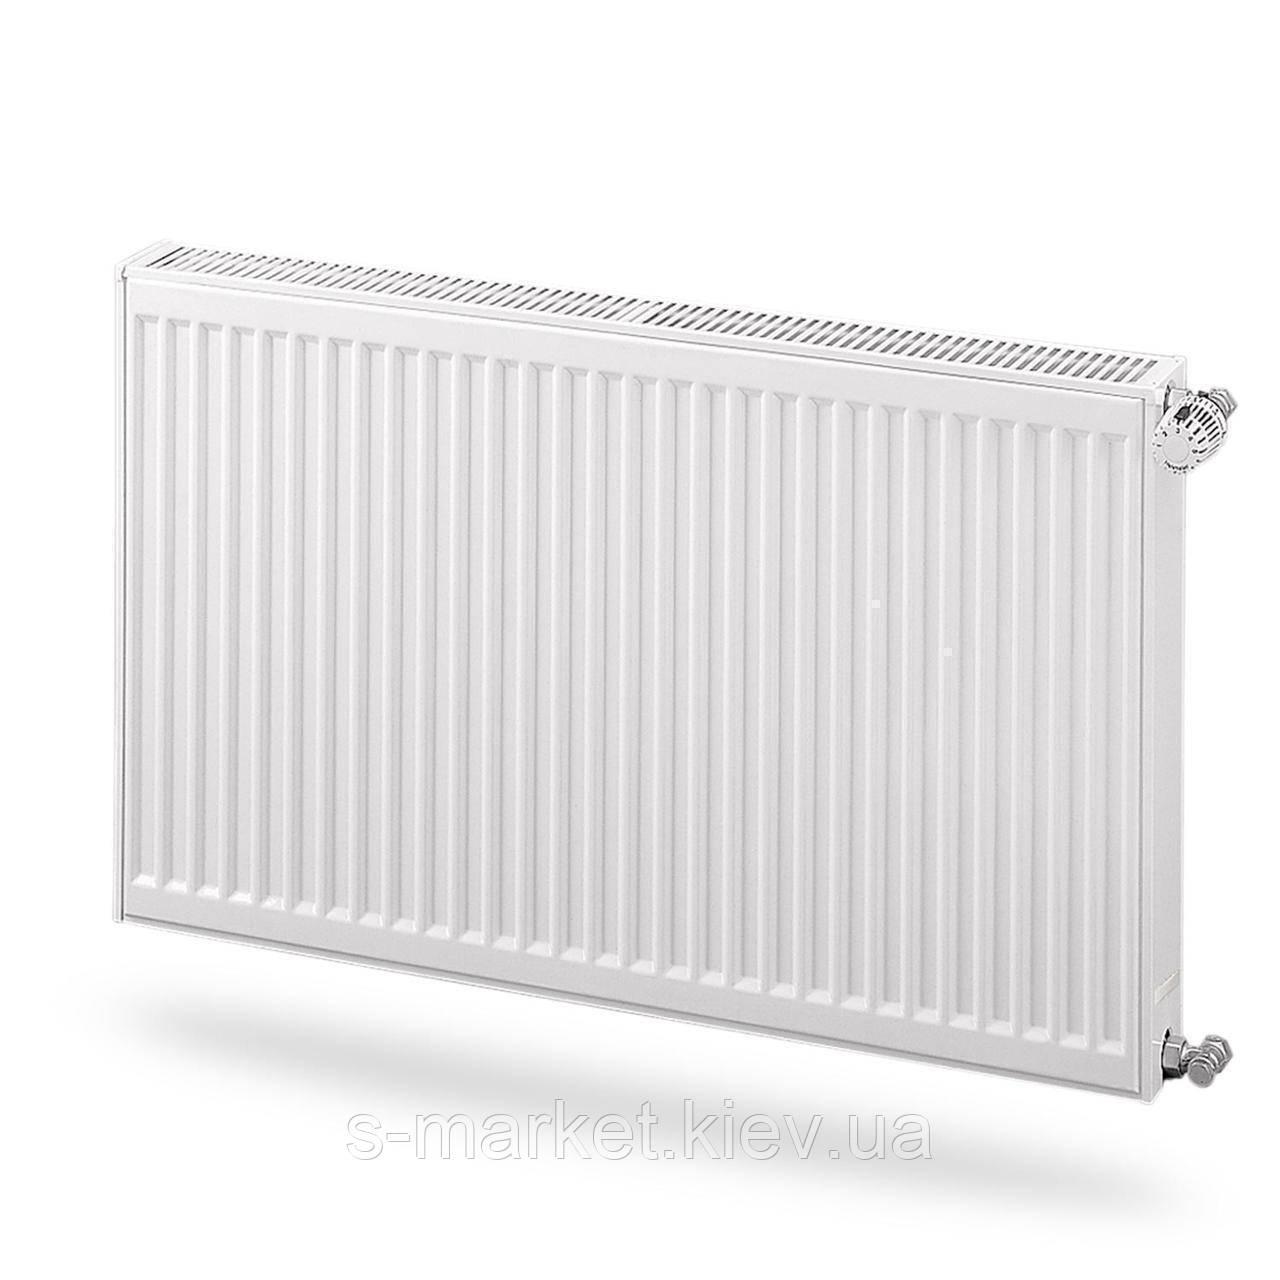 Радиатор Purmo Compact 11 тип 500х1400